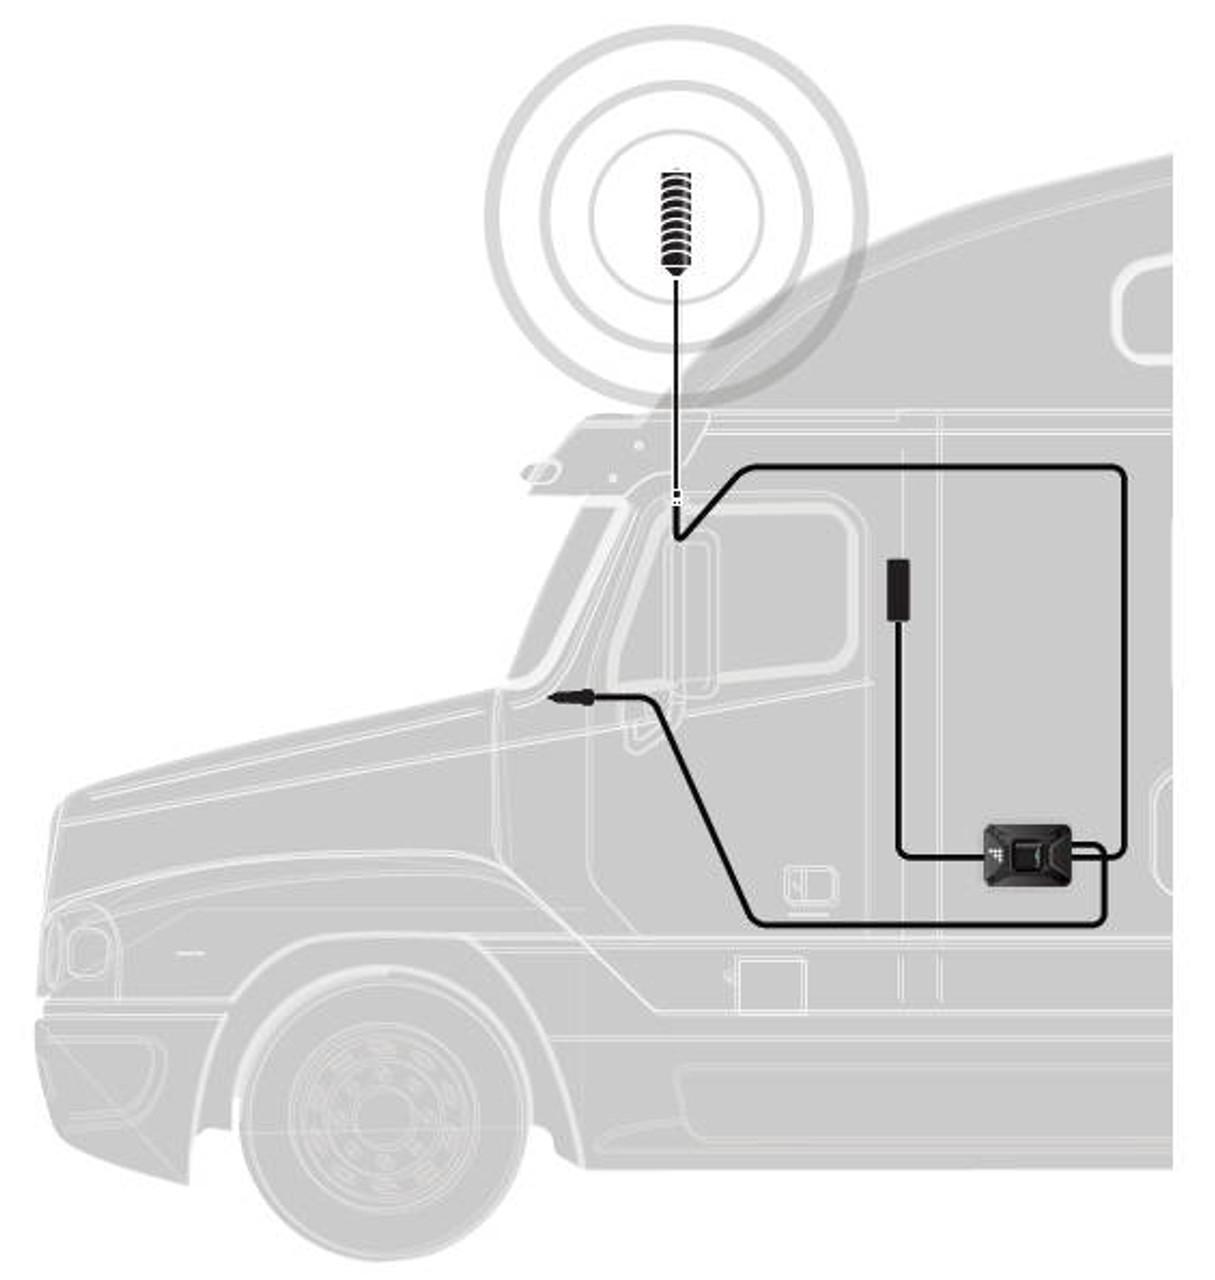 medium resolution of weboost drive 4g x otr truck signal booster system diagram